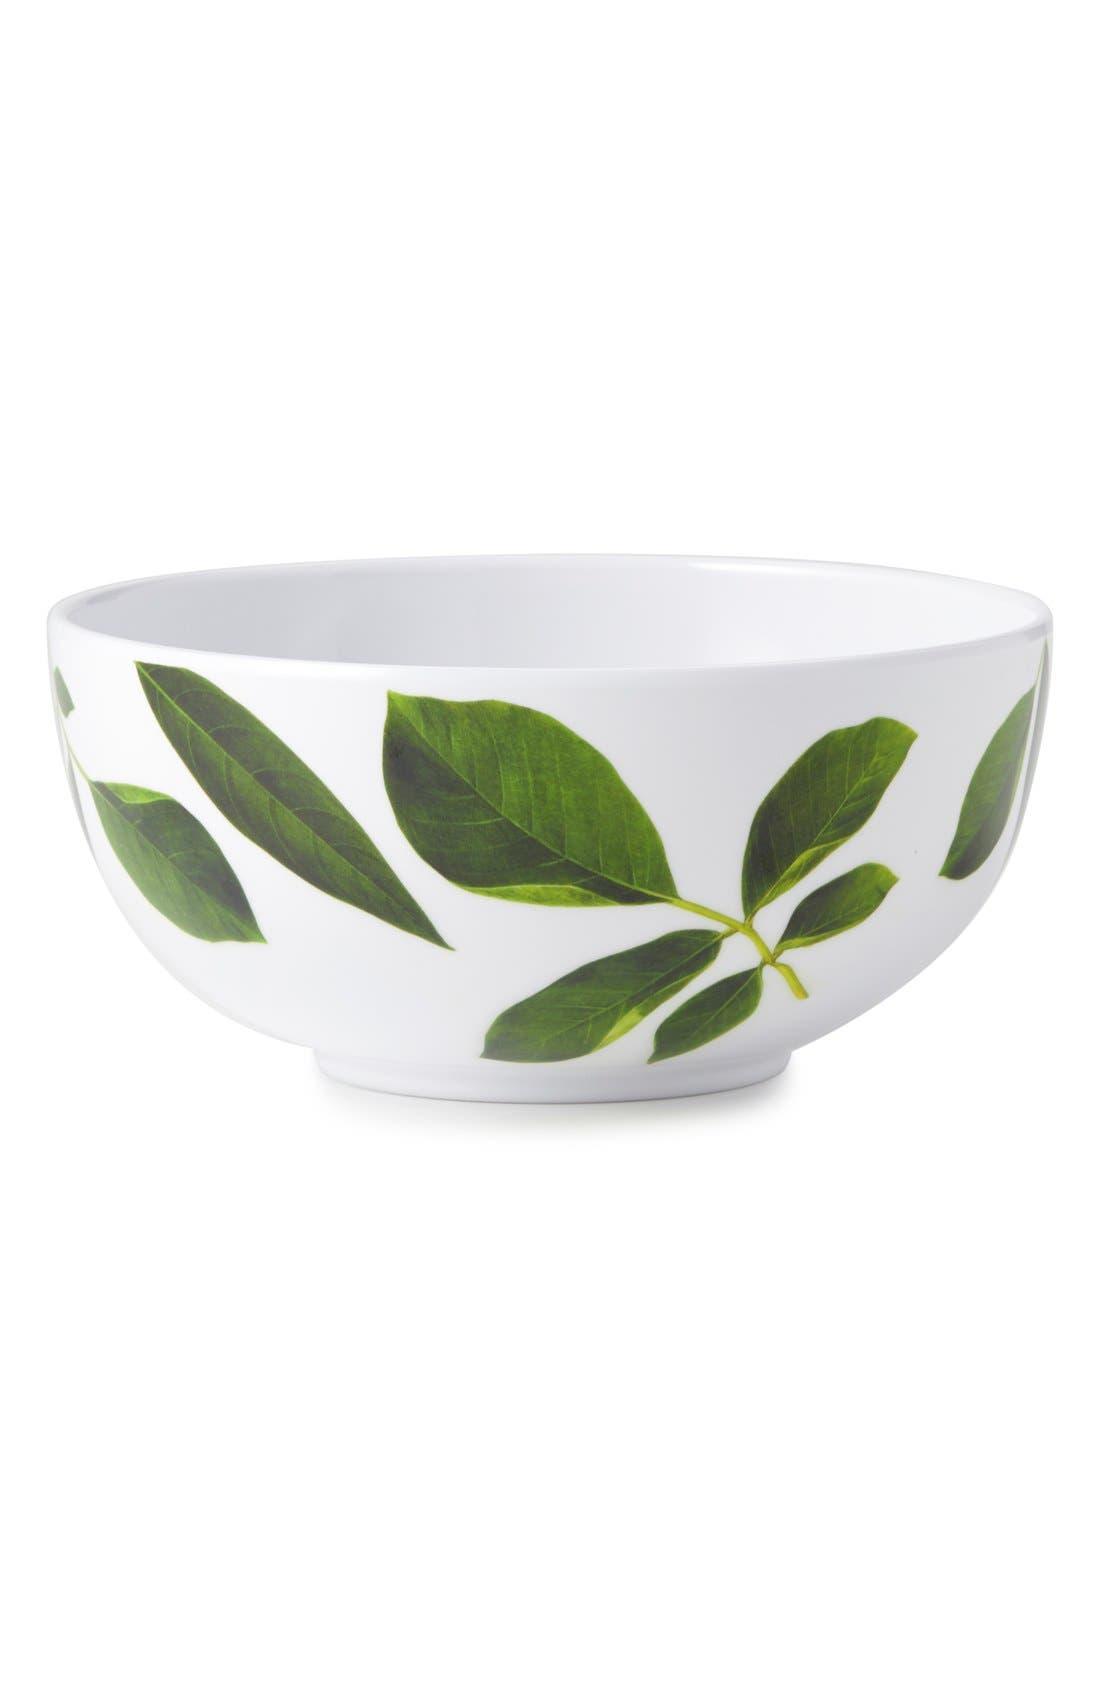 Alternate Image 1 Selected - kate spade new york 'patio floral' melamine bowl